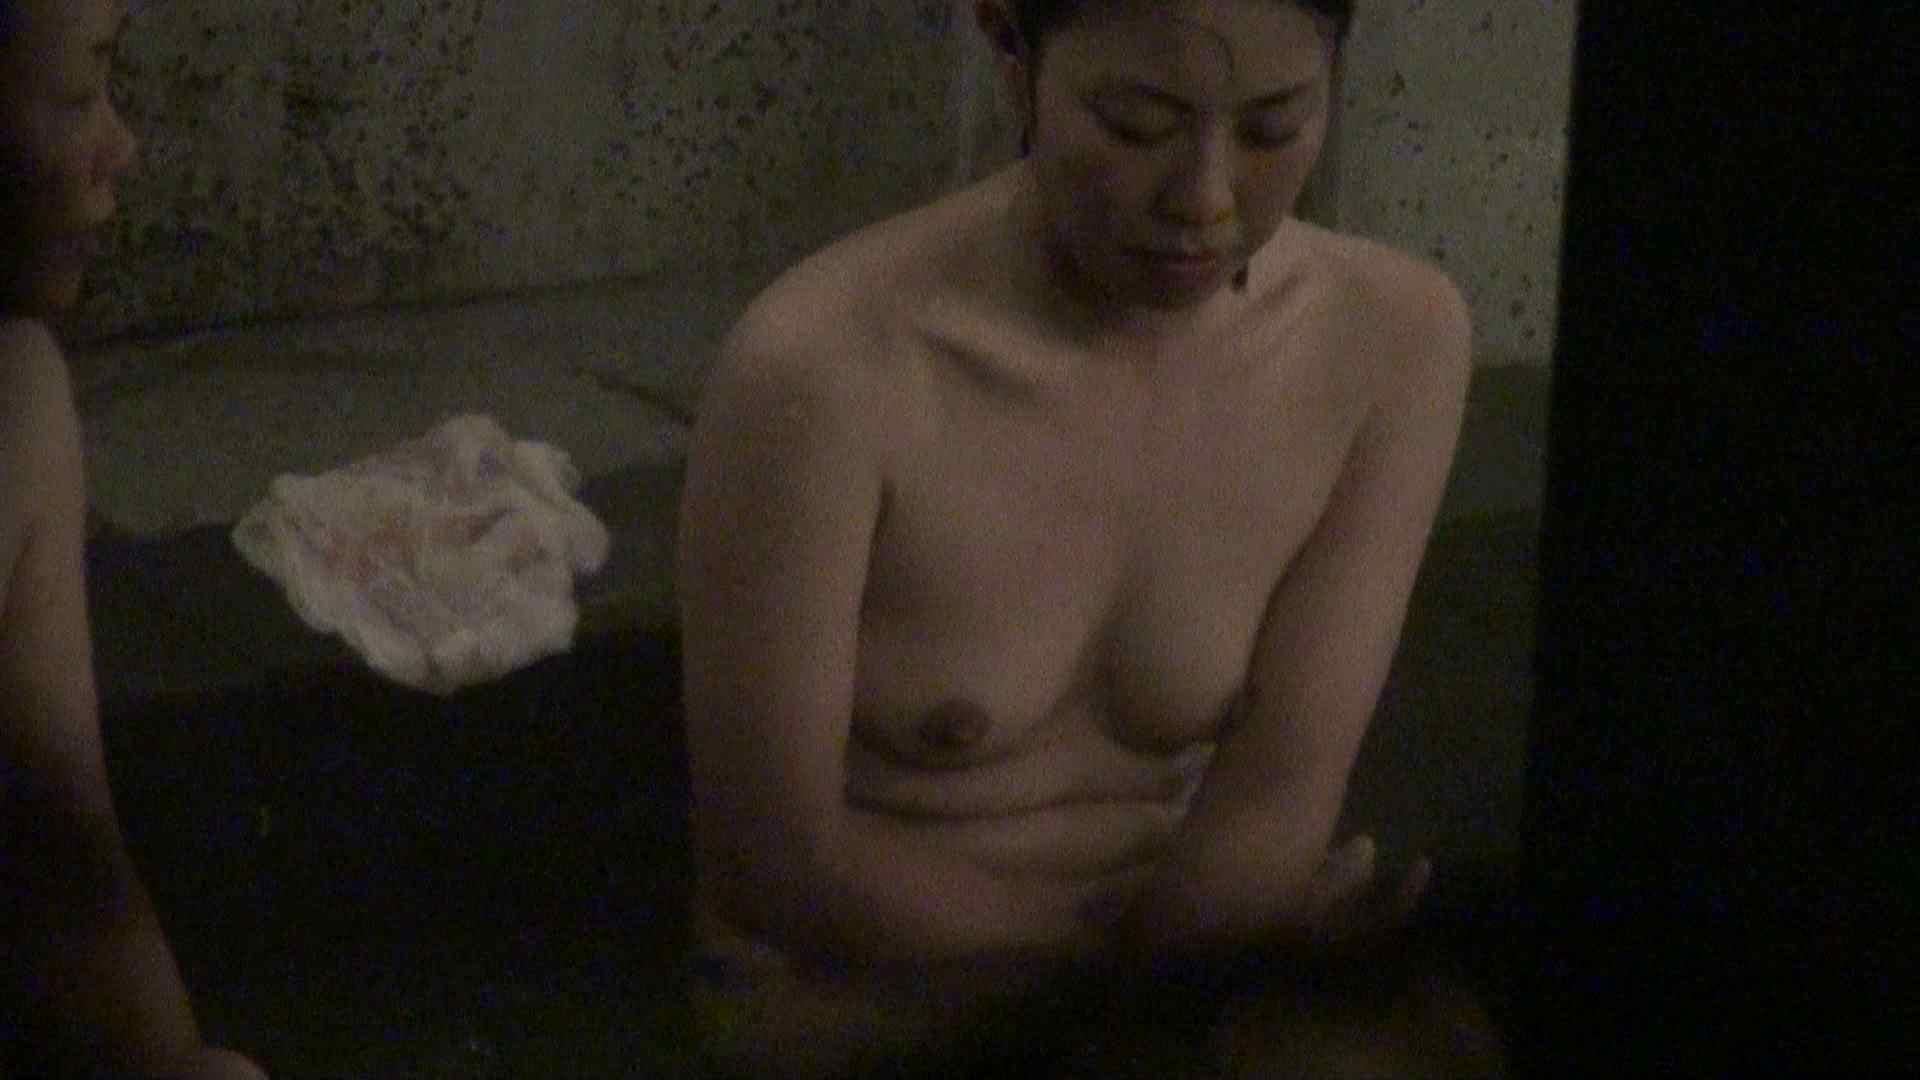 Aquaな露天風呂Vol.330 盗撮   HなOL  83pic 13